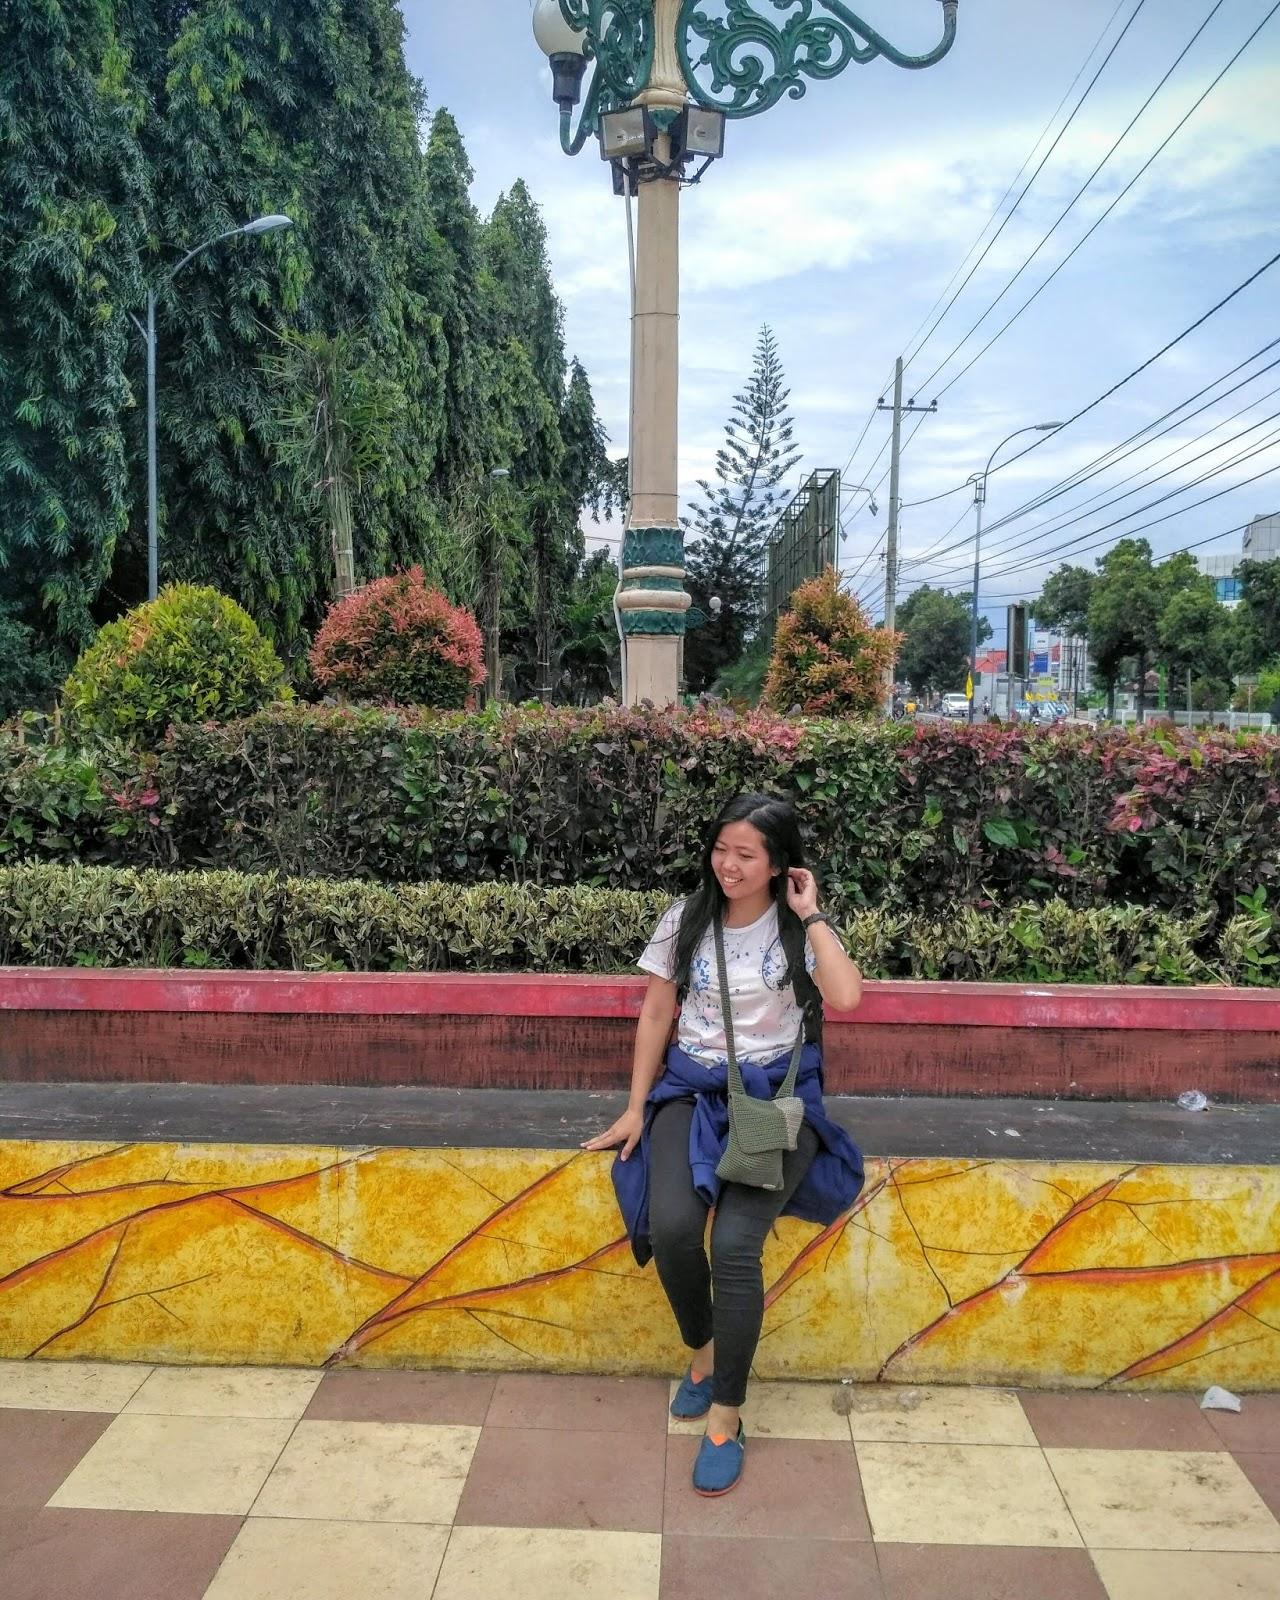 Alun Situbondo Menelusuri Jawa Timur Bagus Gayanya Sok Candid Padahal